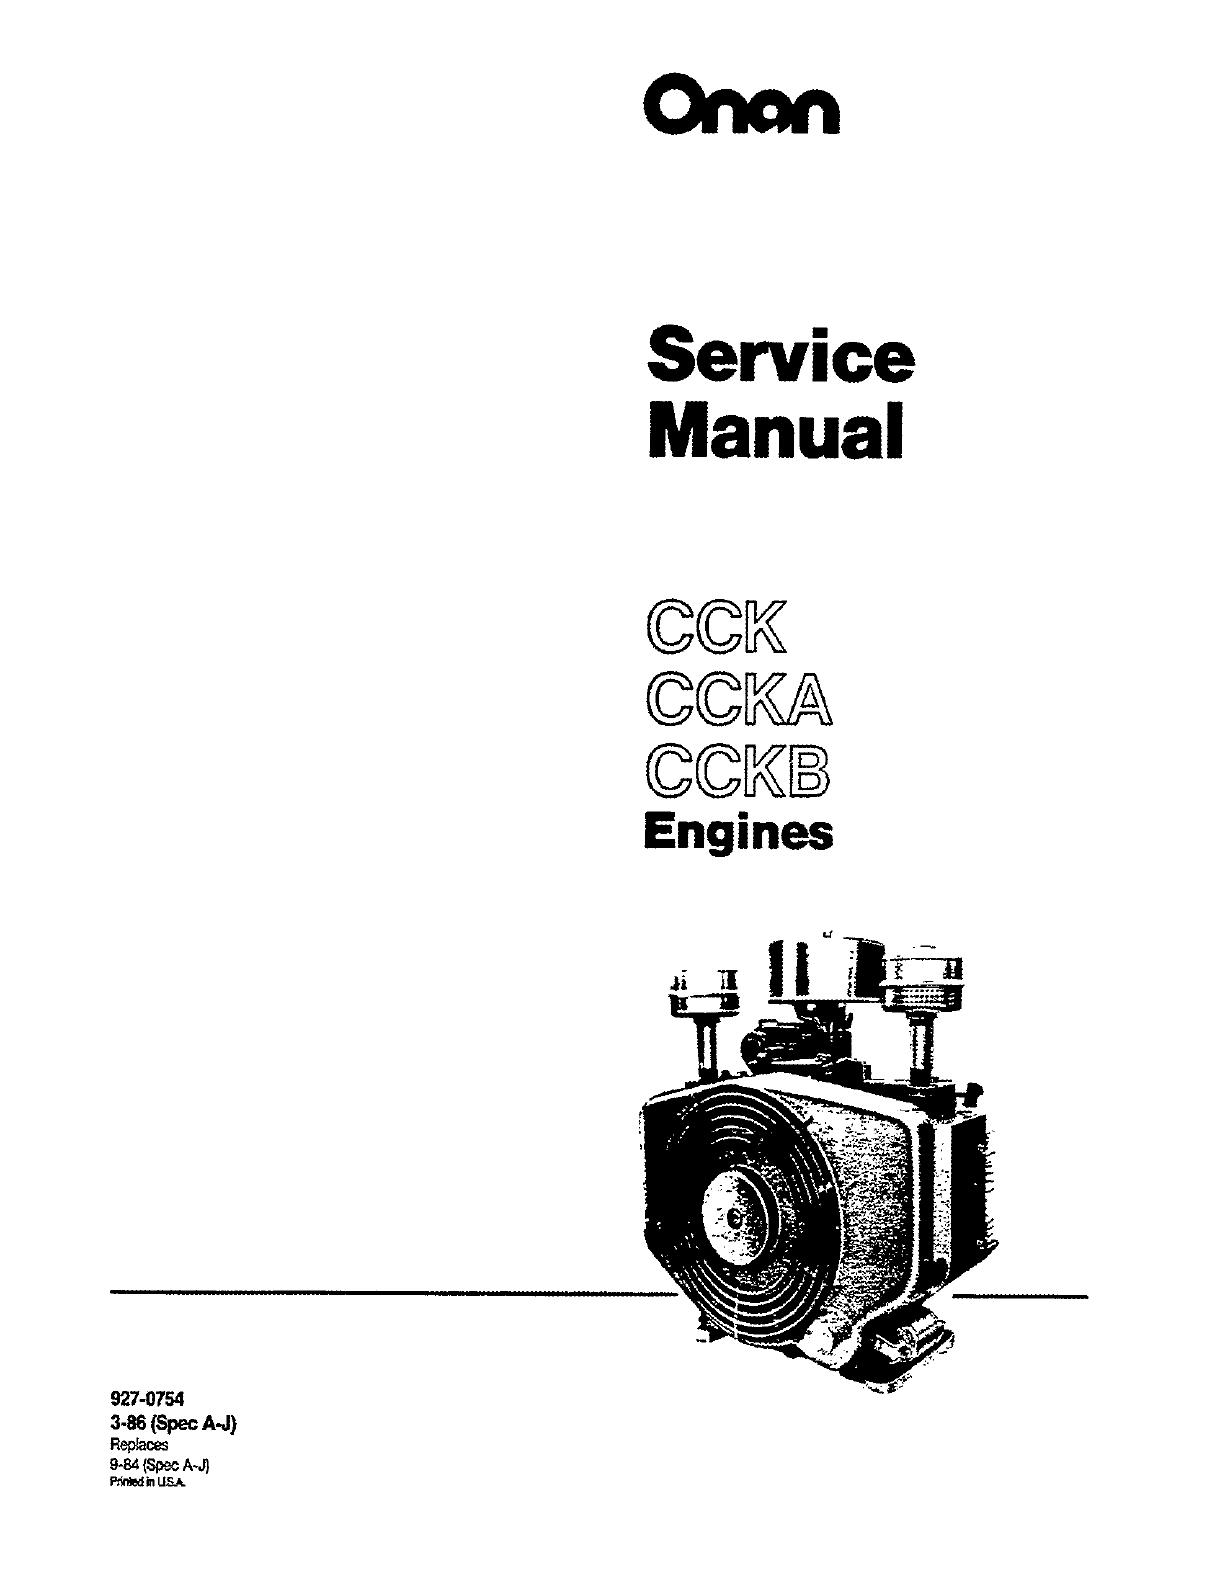 Generac 4000xl Engine Owners Manual Ebook 2002 Aprilia Rxv Front Fuse Box Diagram Array Onan Service 927 0754 Wiring U2022 Rh Alumniplus Co